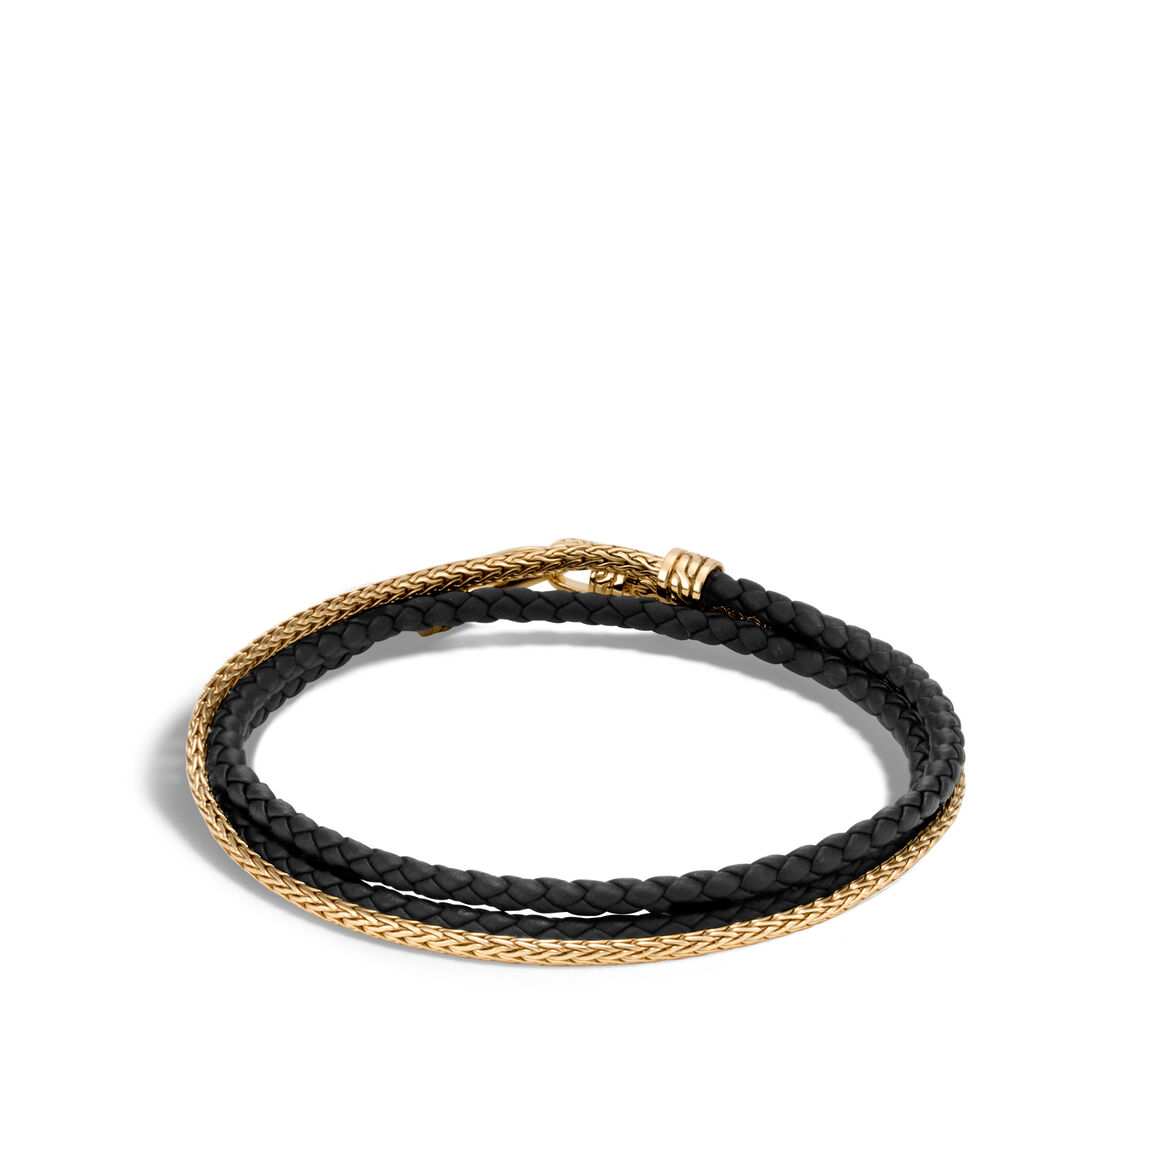 Chain Triple Wrap 2.5MM Bracelet, 18K Gold , Leather